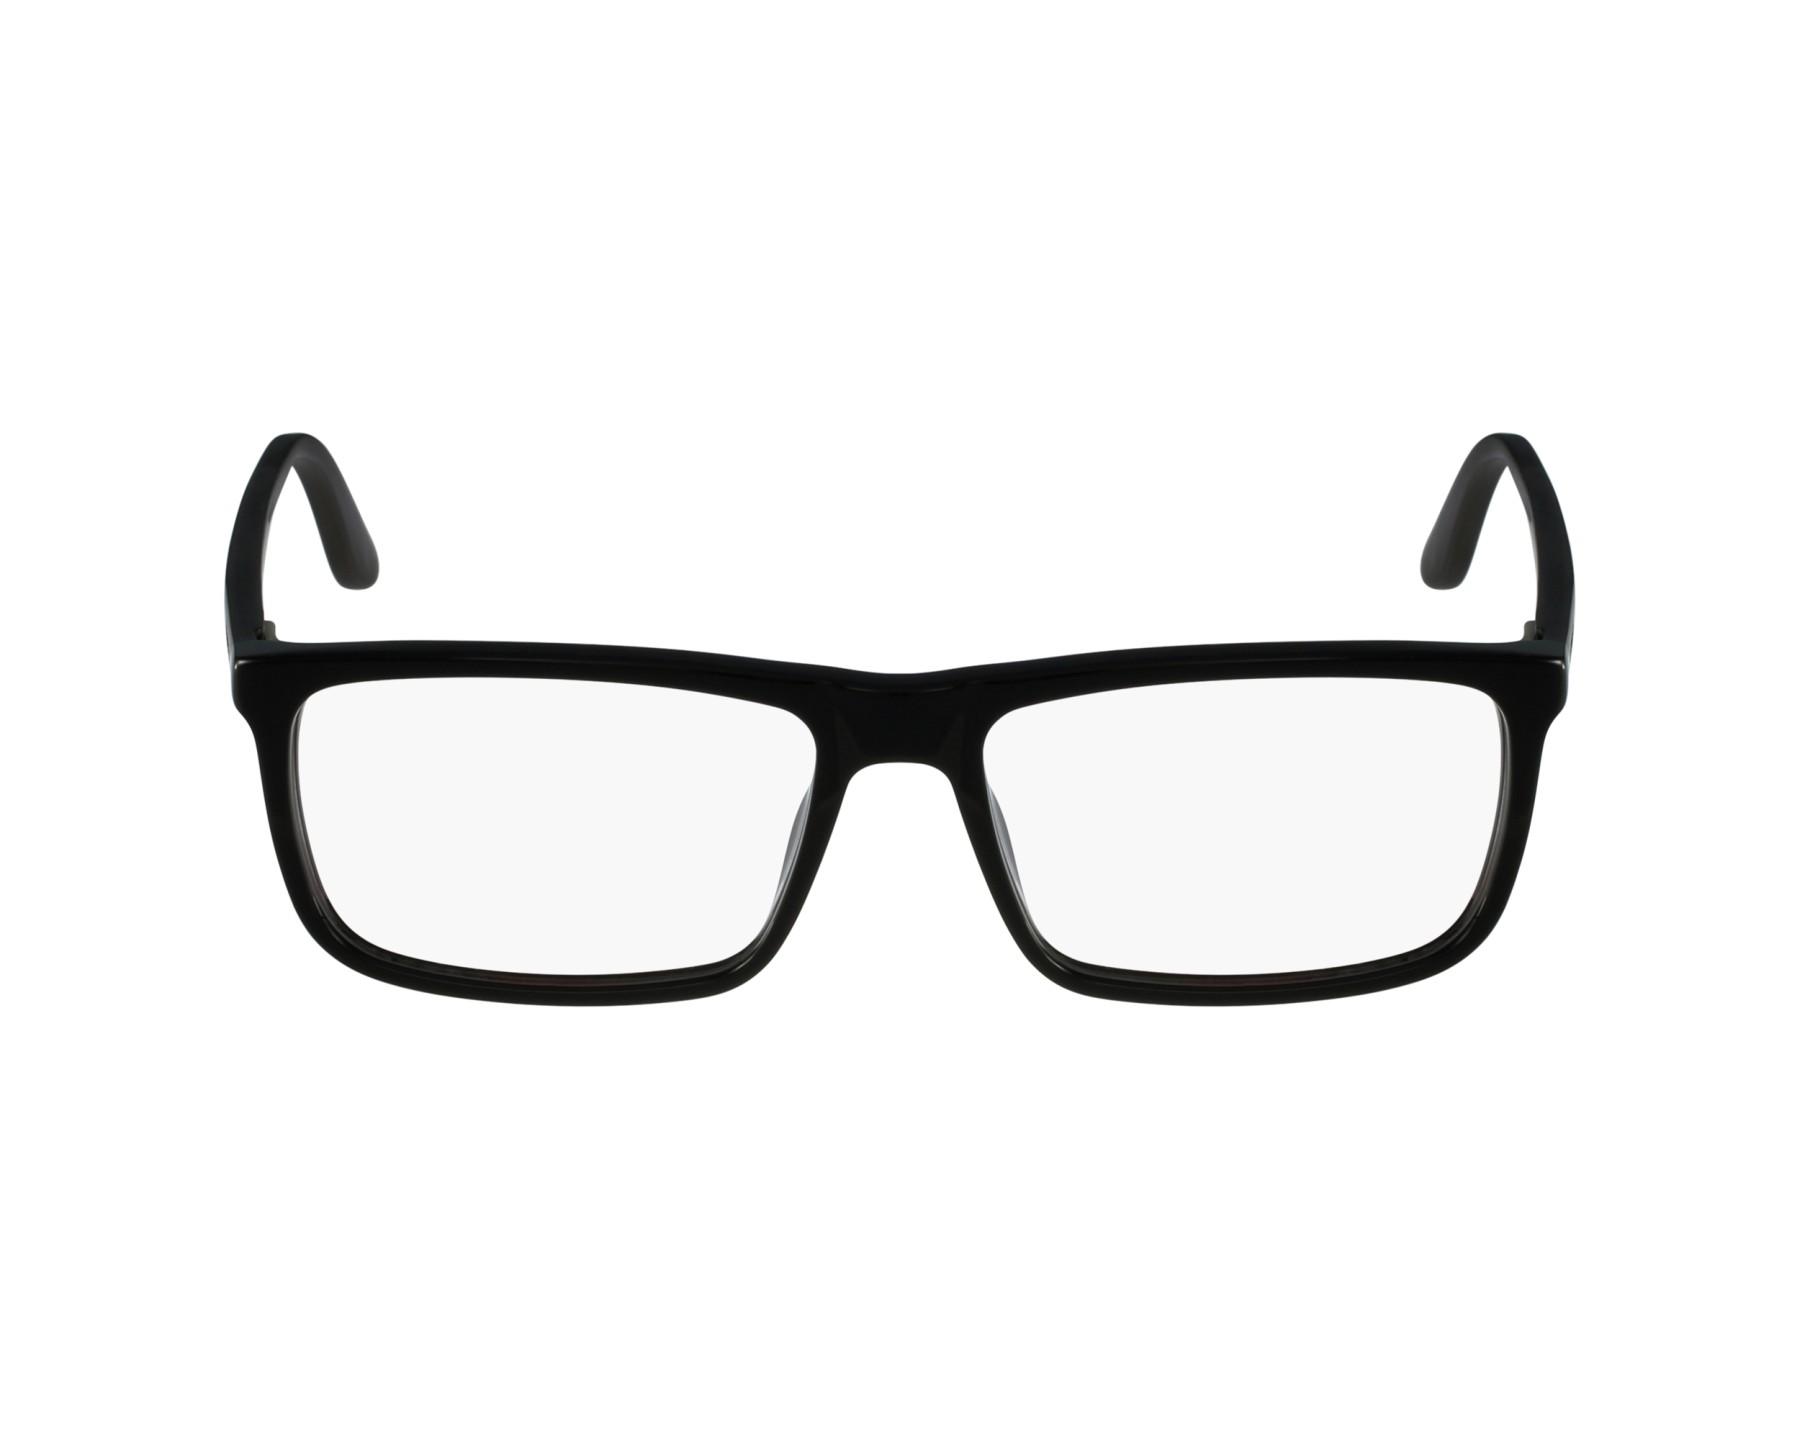 Carrera Eyeglasses Black CA-6643 64H - Visionet US